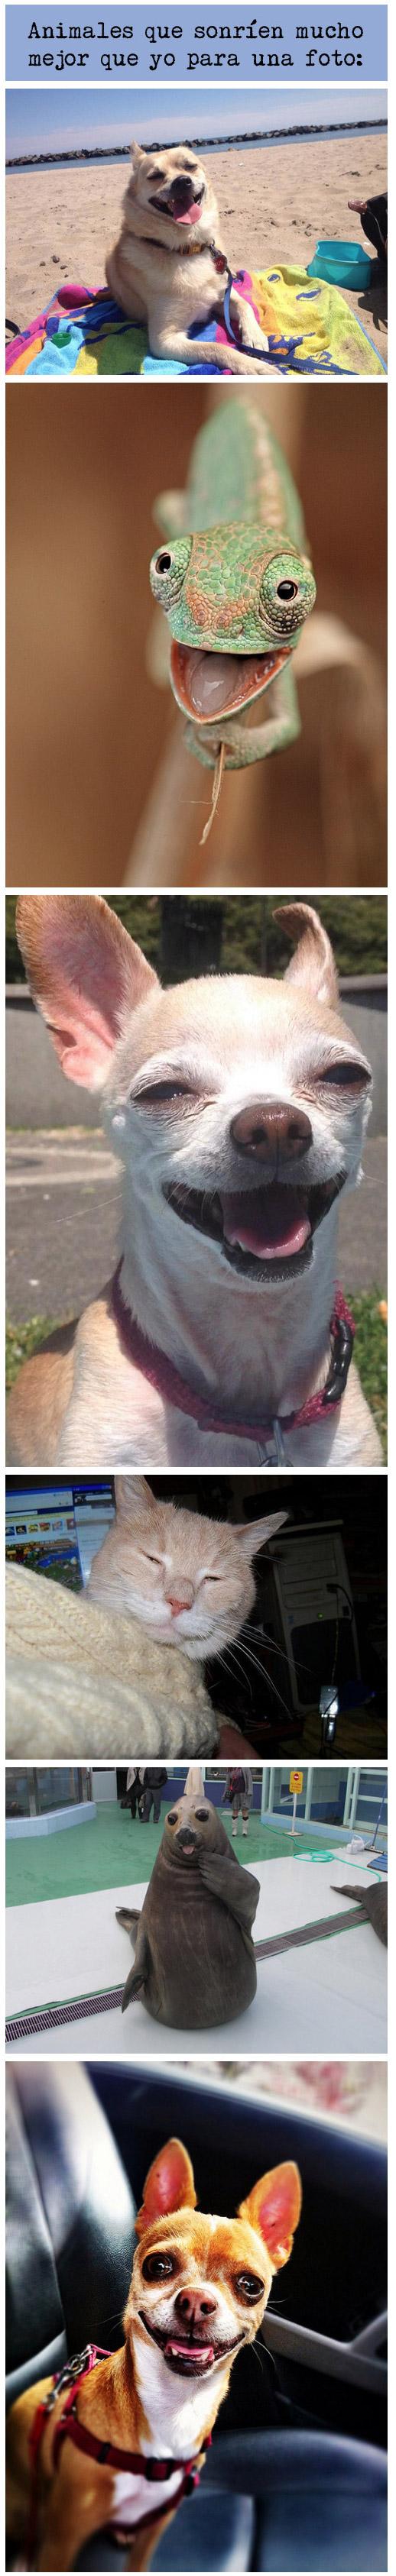 Animales que sonríen